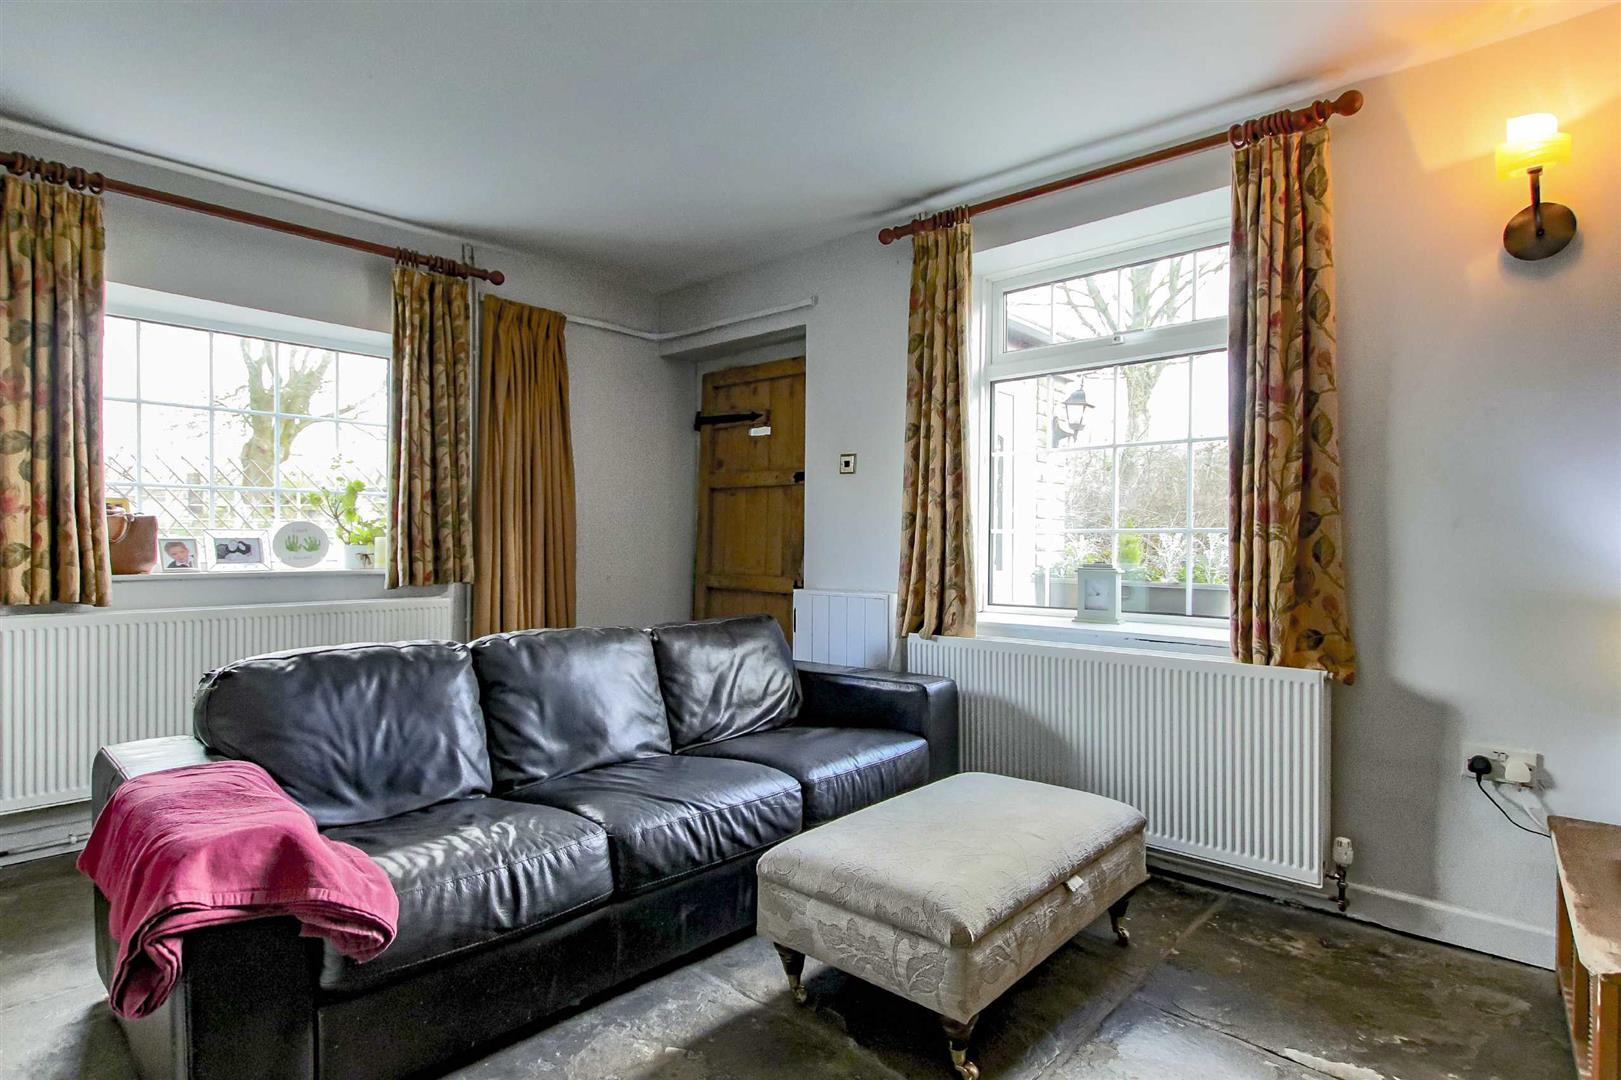 4 Bedroom Detached House For Sale - p033686_28.jpg